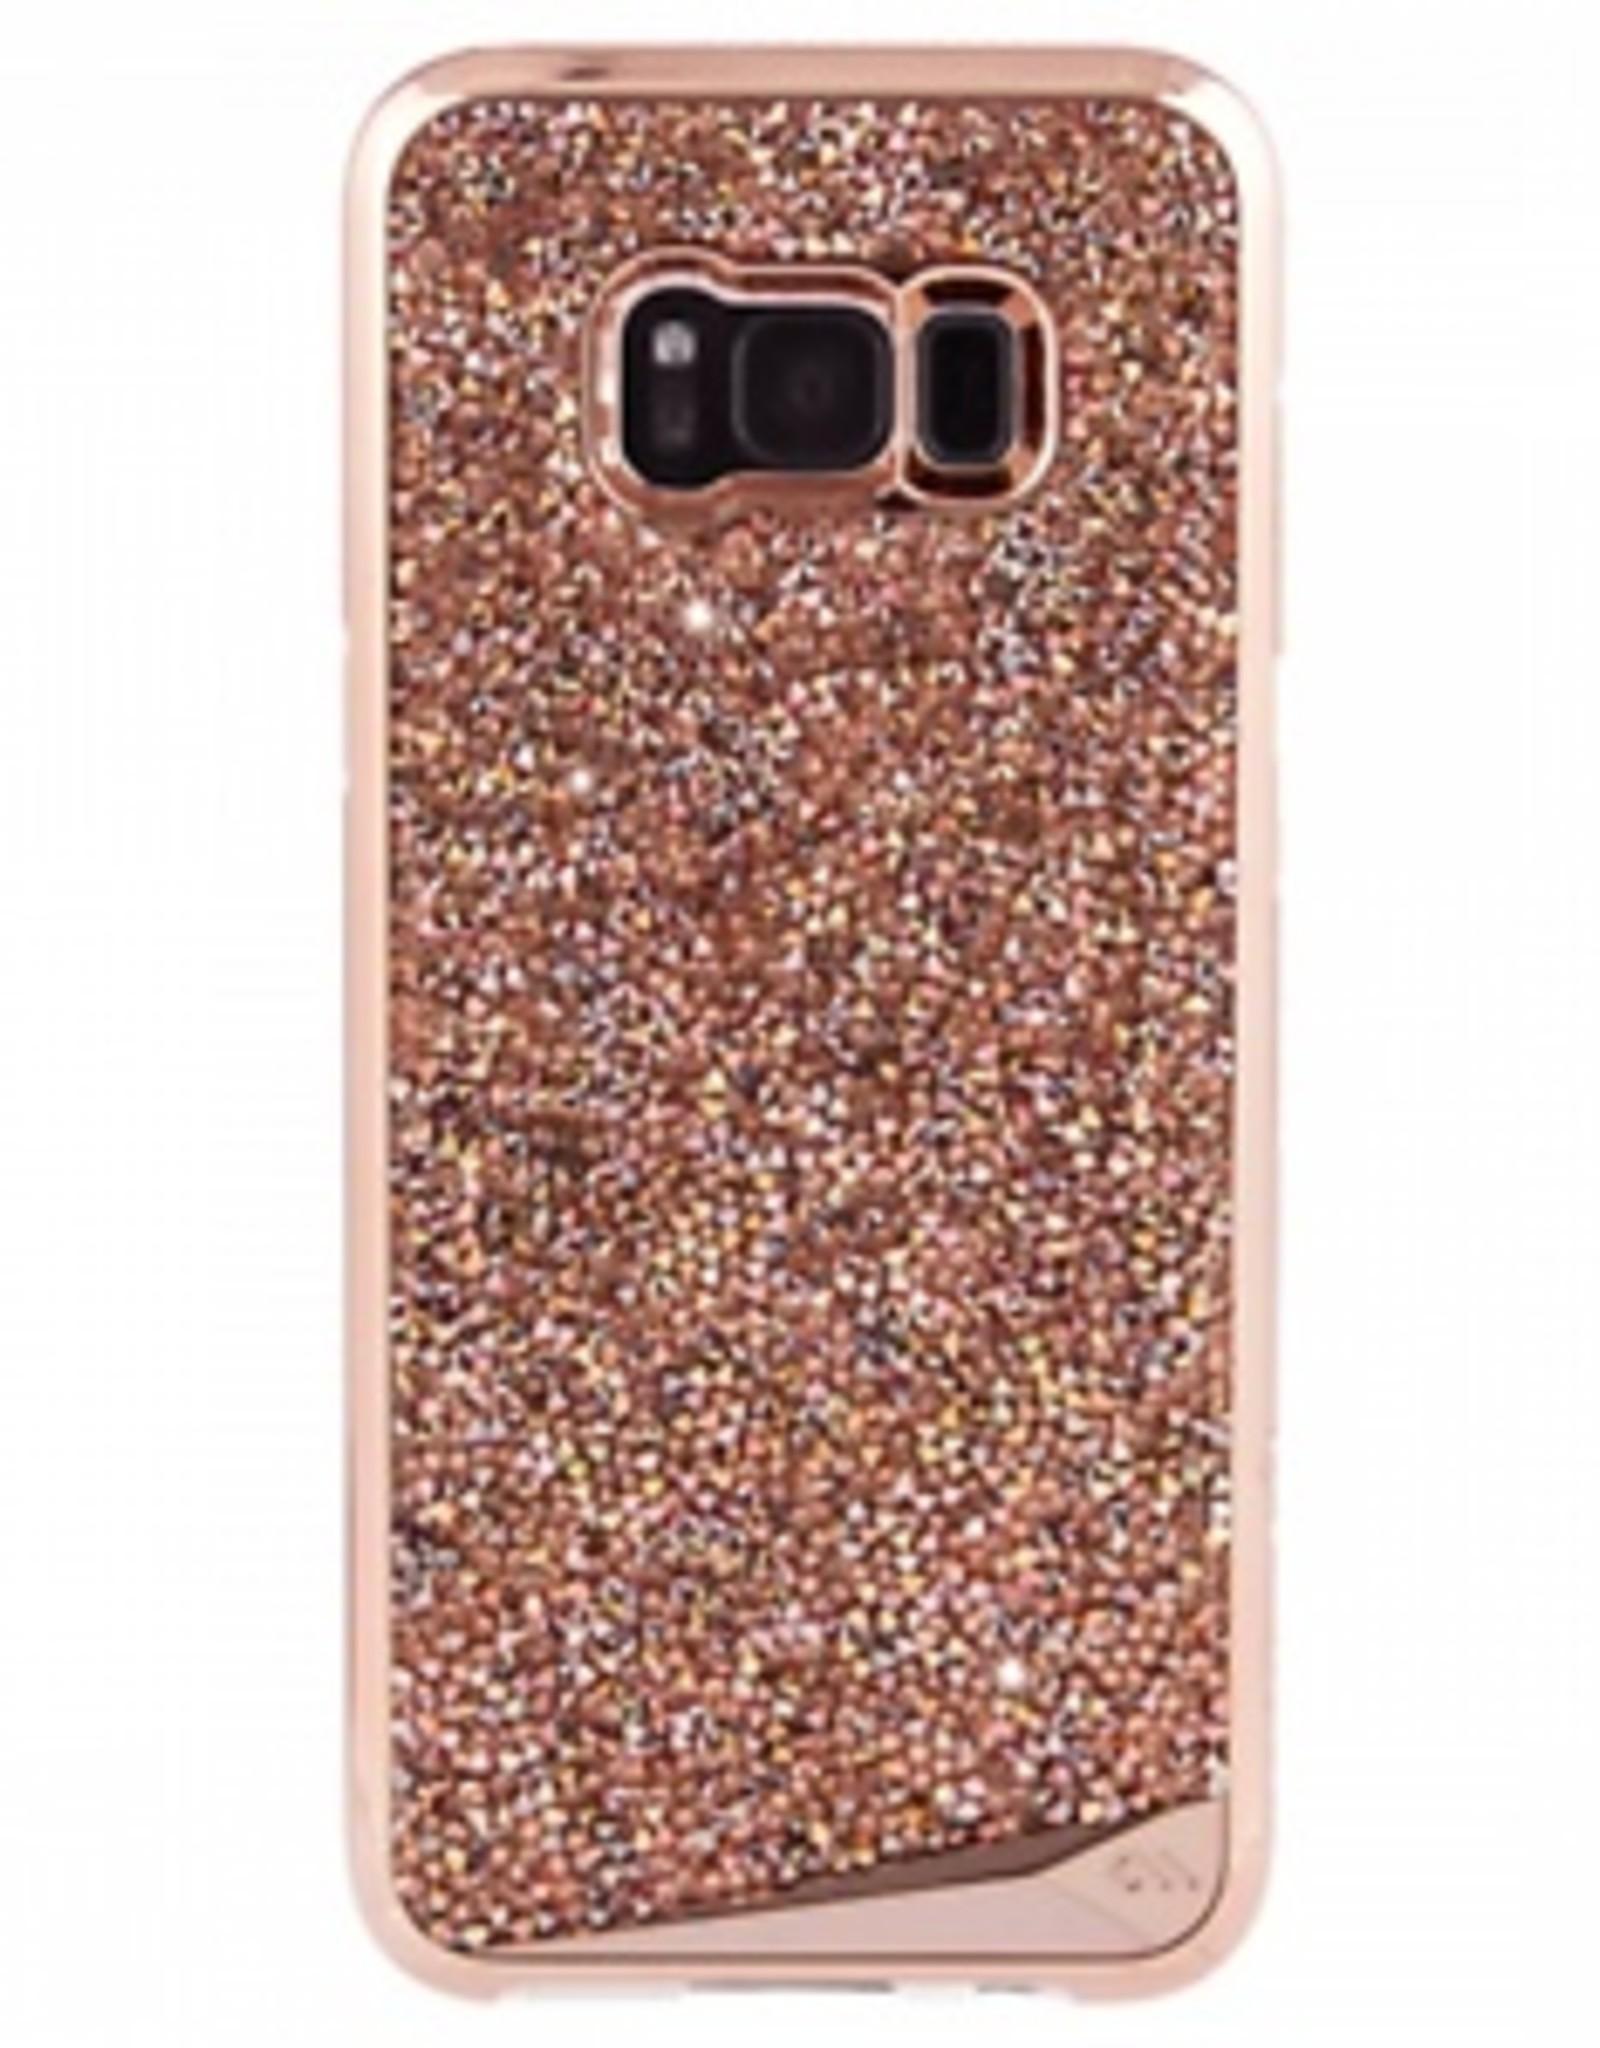 Case-Mate Case-Mate | Samsung Galaxy s8 Rose Gold Brilliance | 15-01604